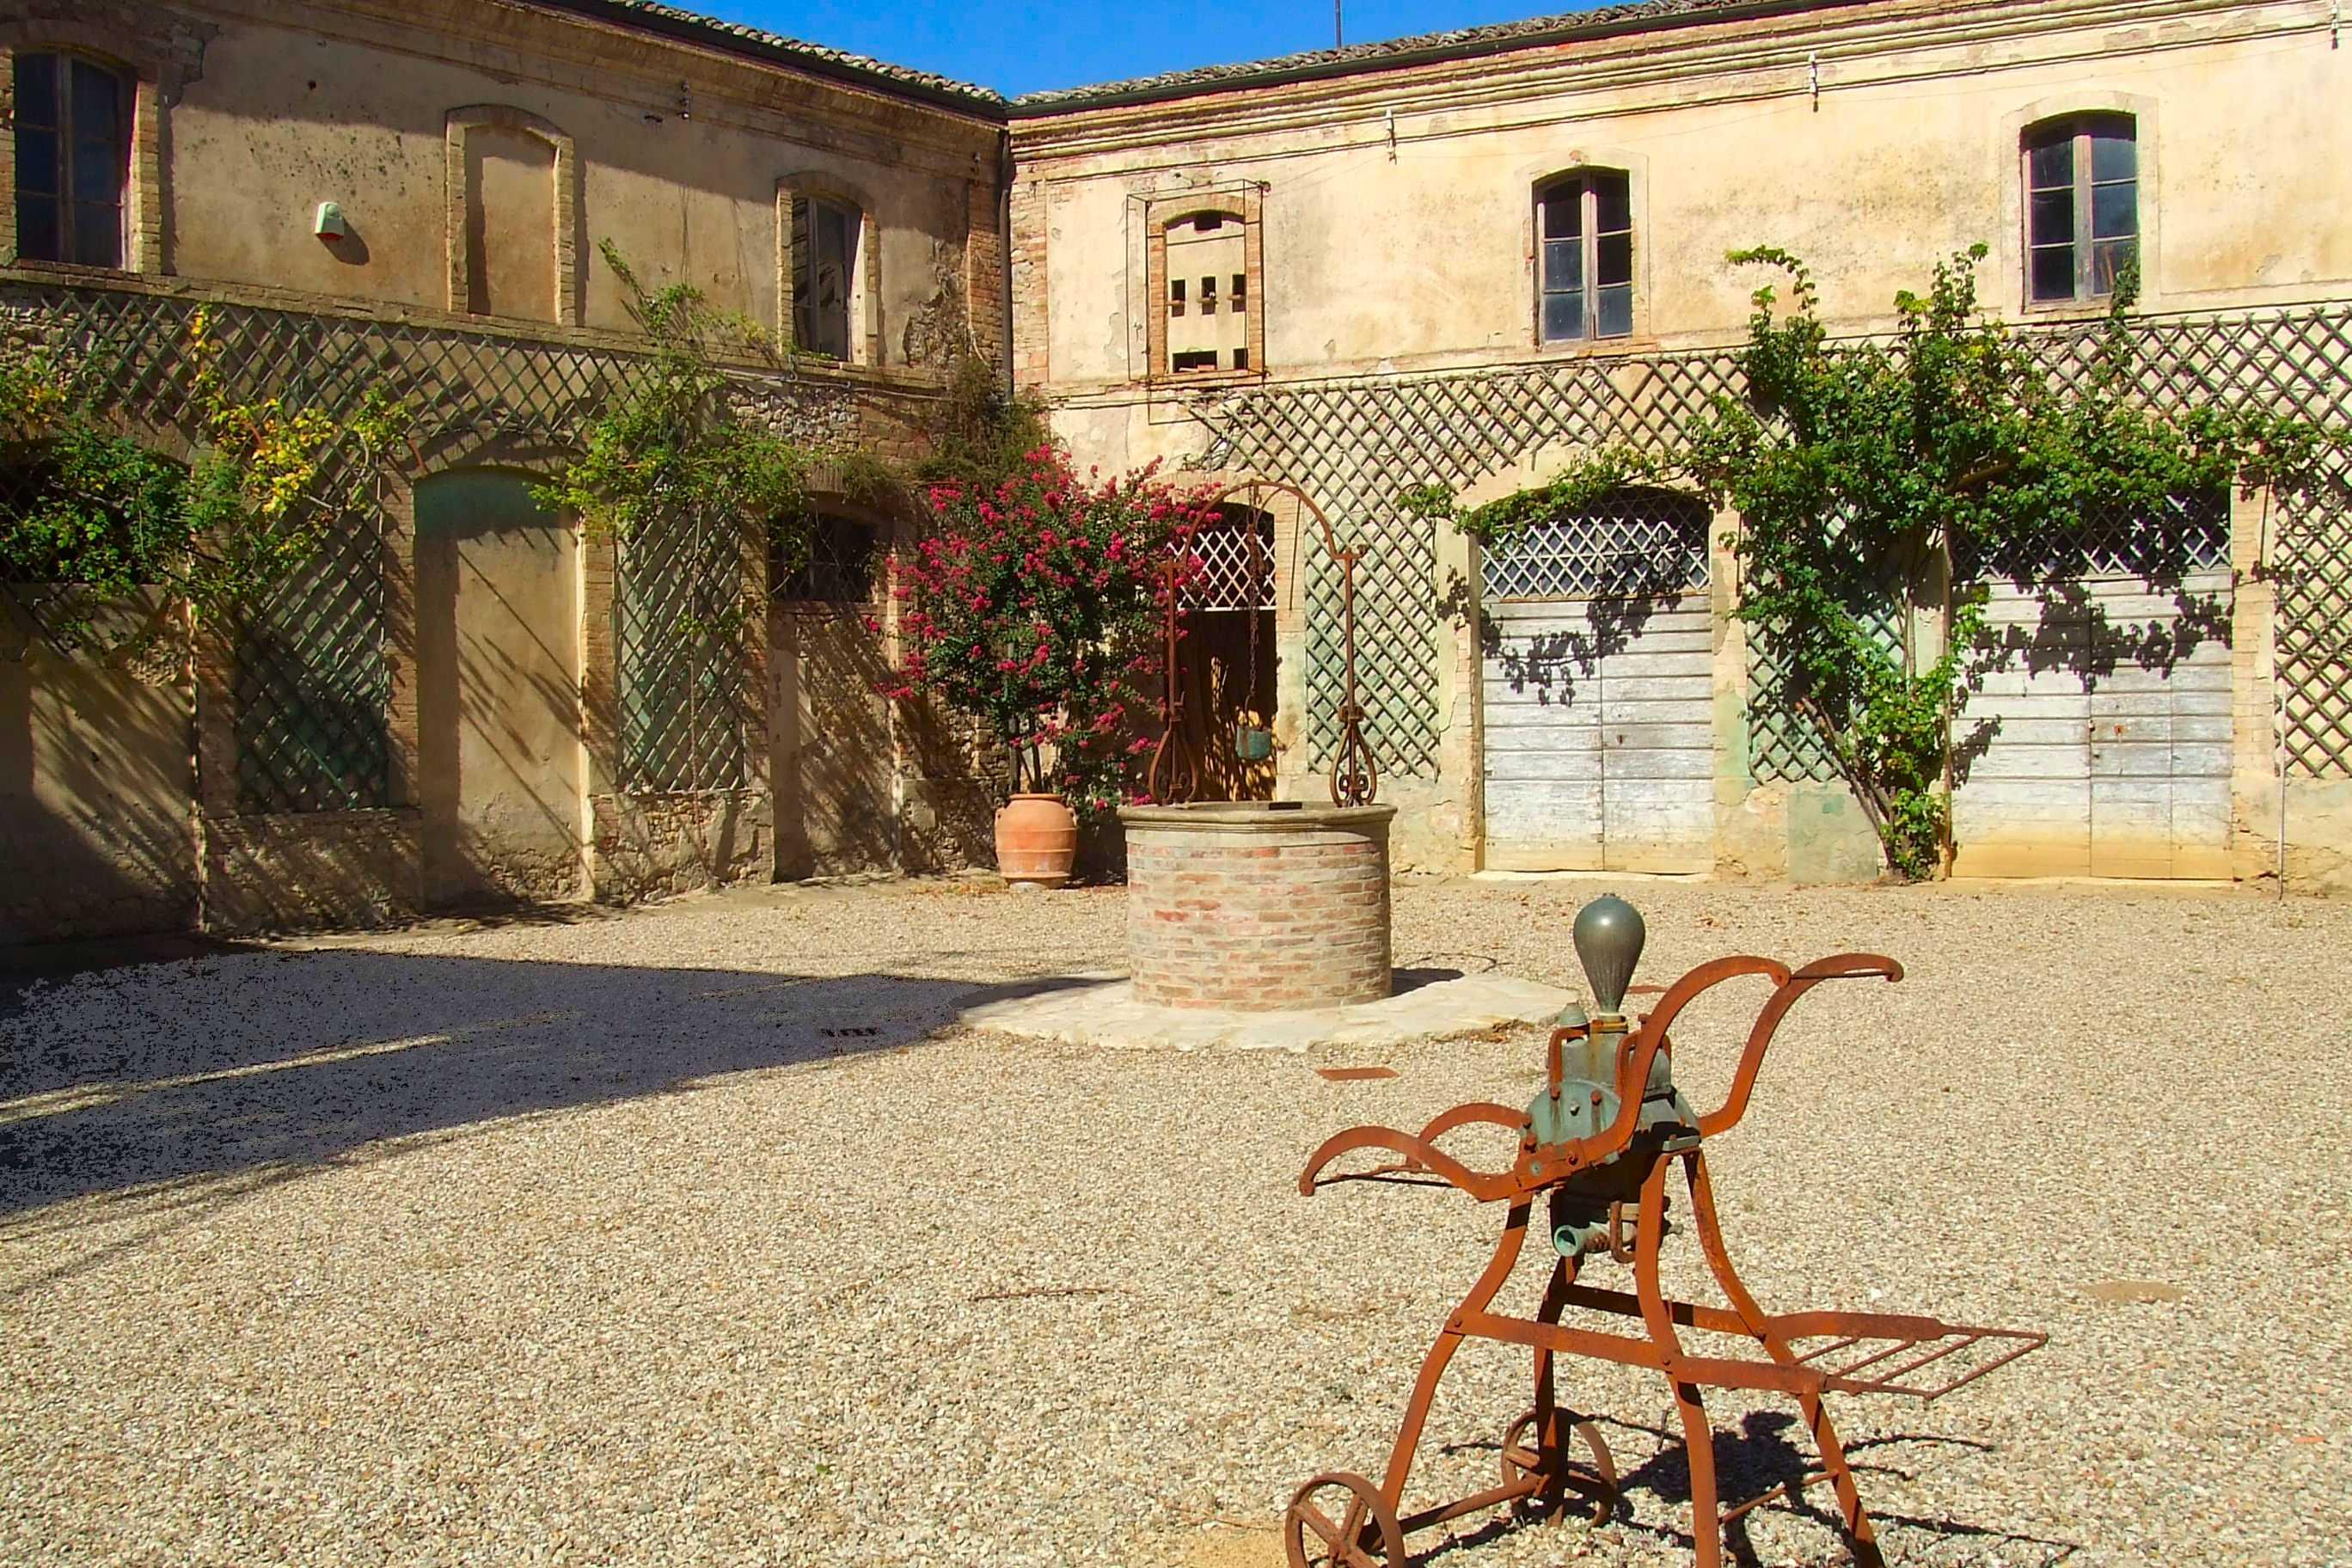 Agriturismo con cantina in toscana